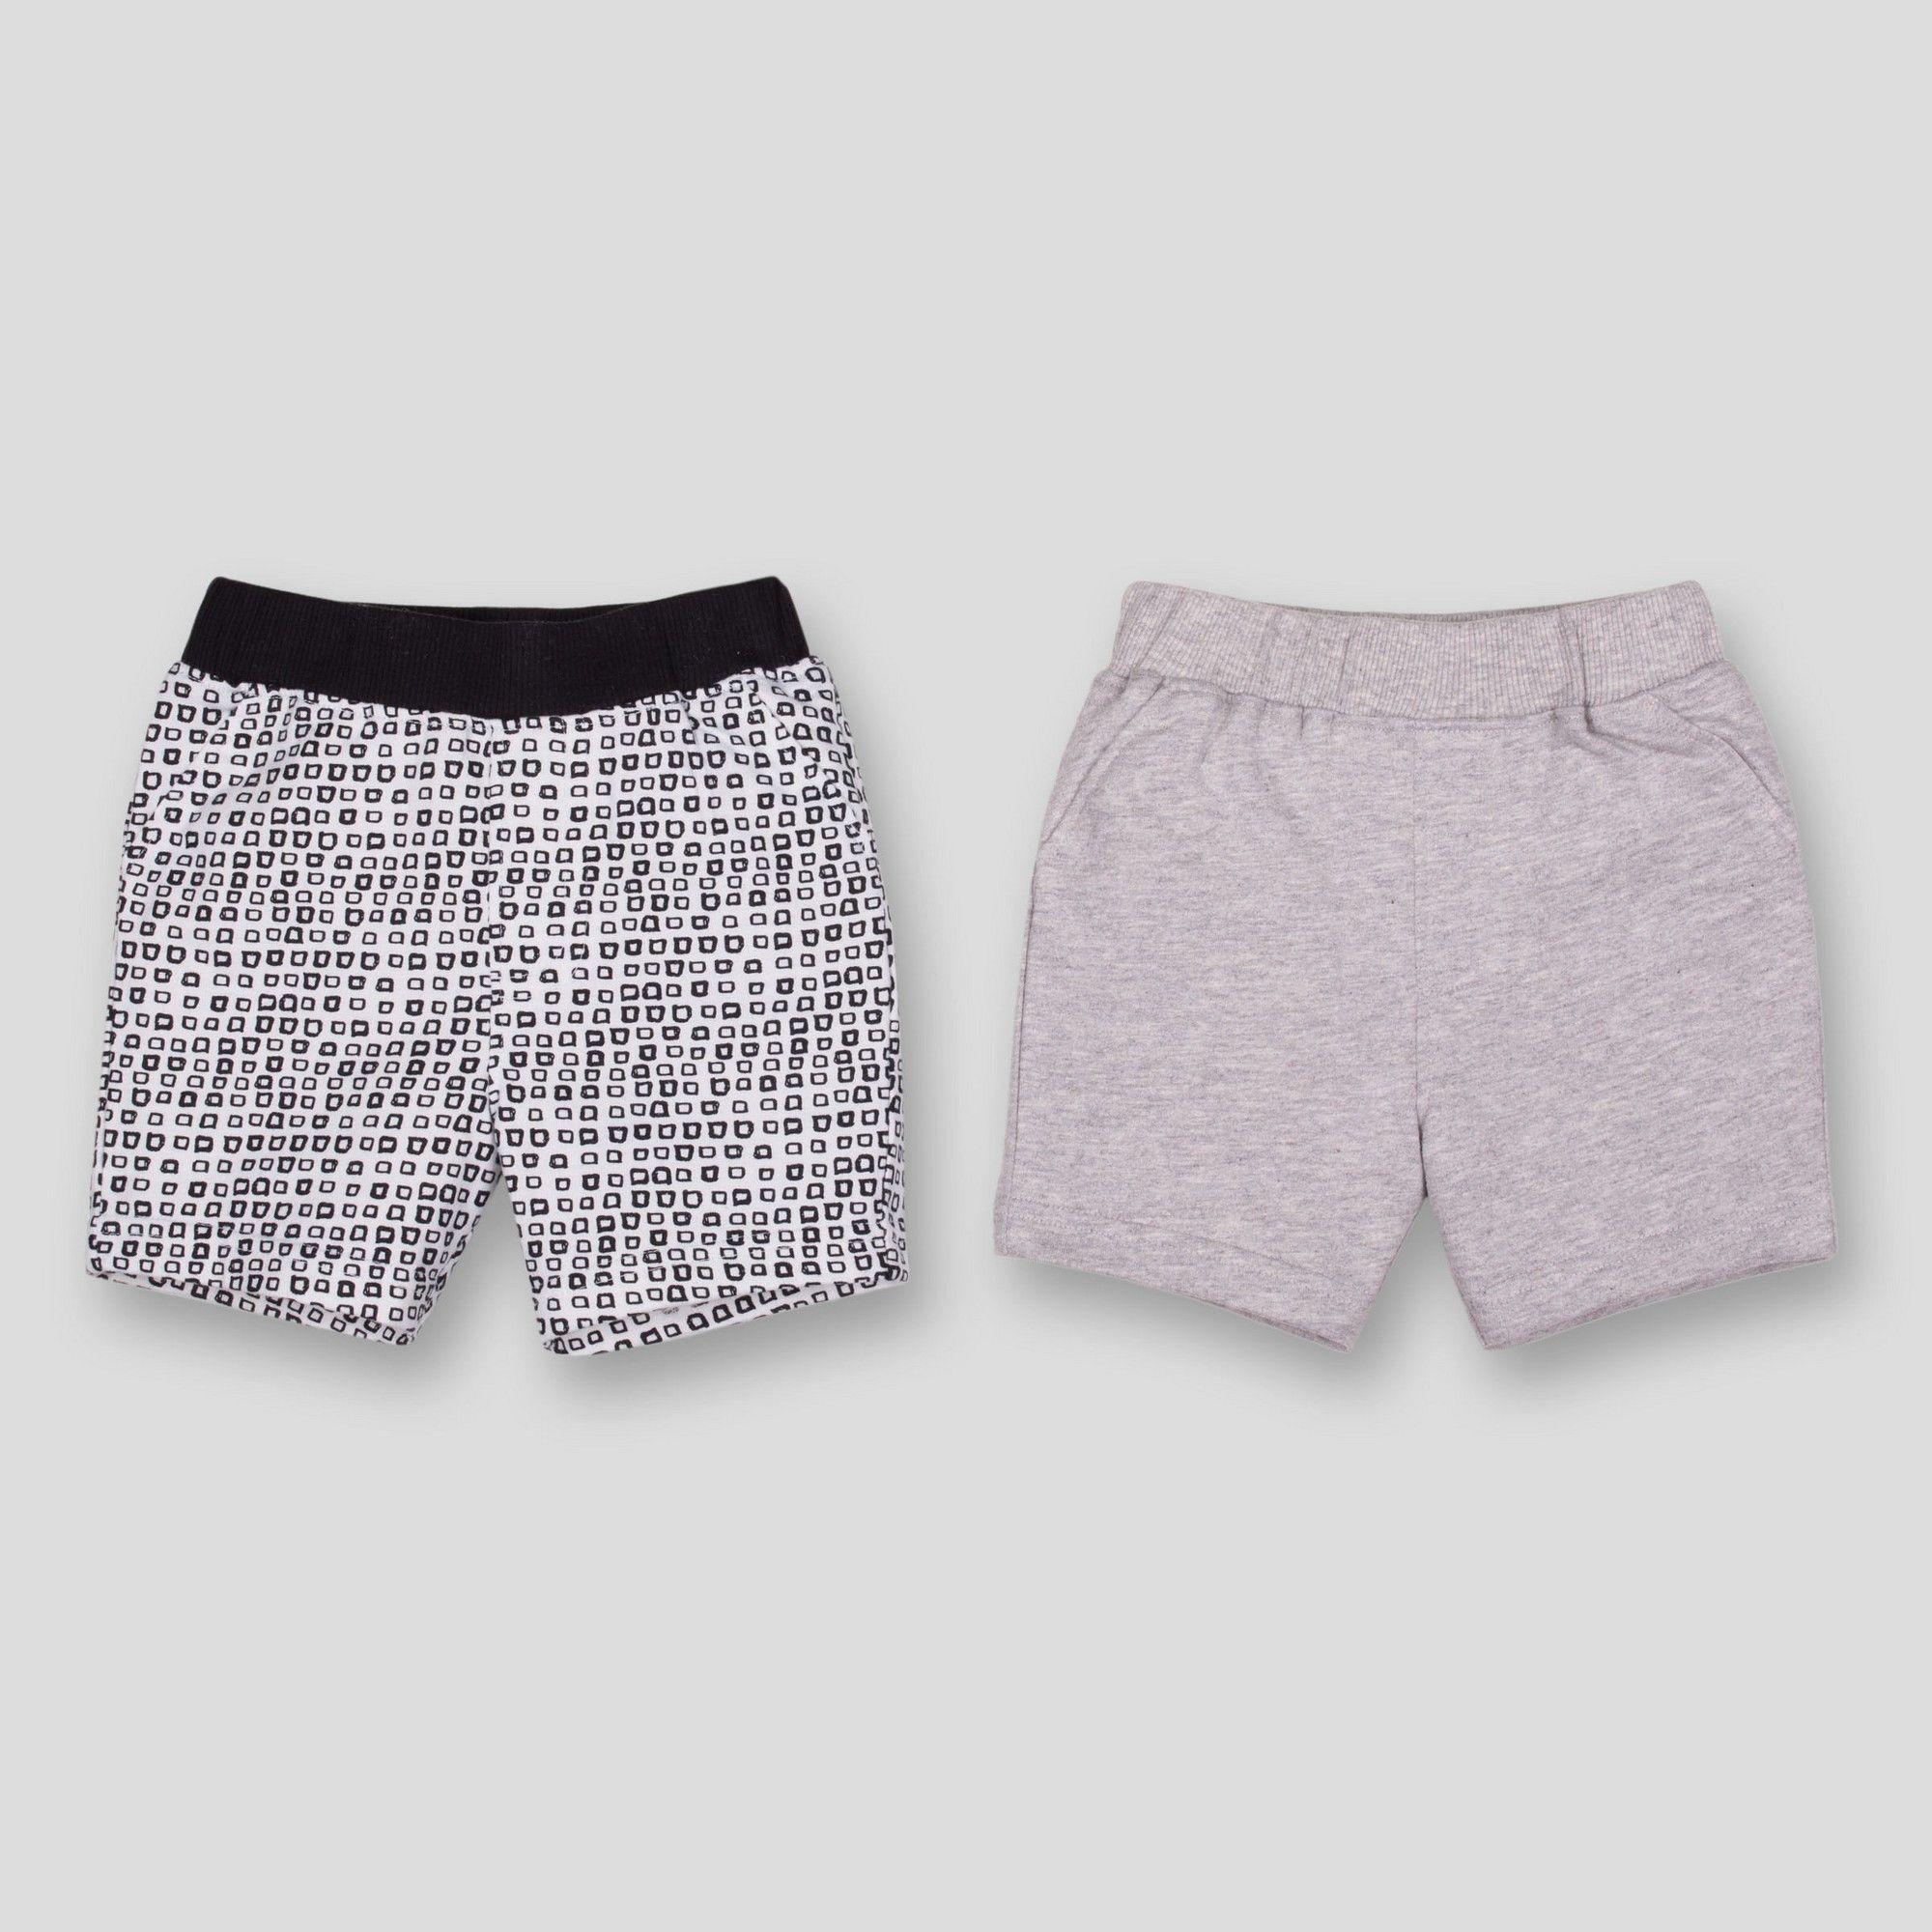 Unisex Shorts Lamaze Organic Baby Organic Baby//Toddler Girl Boy